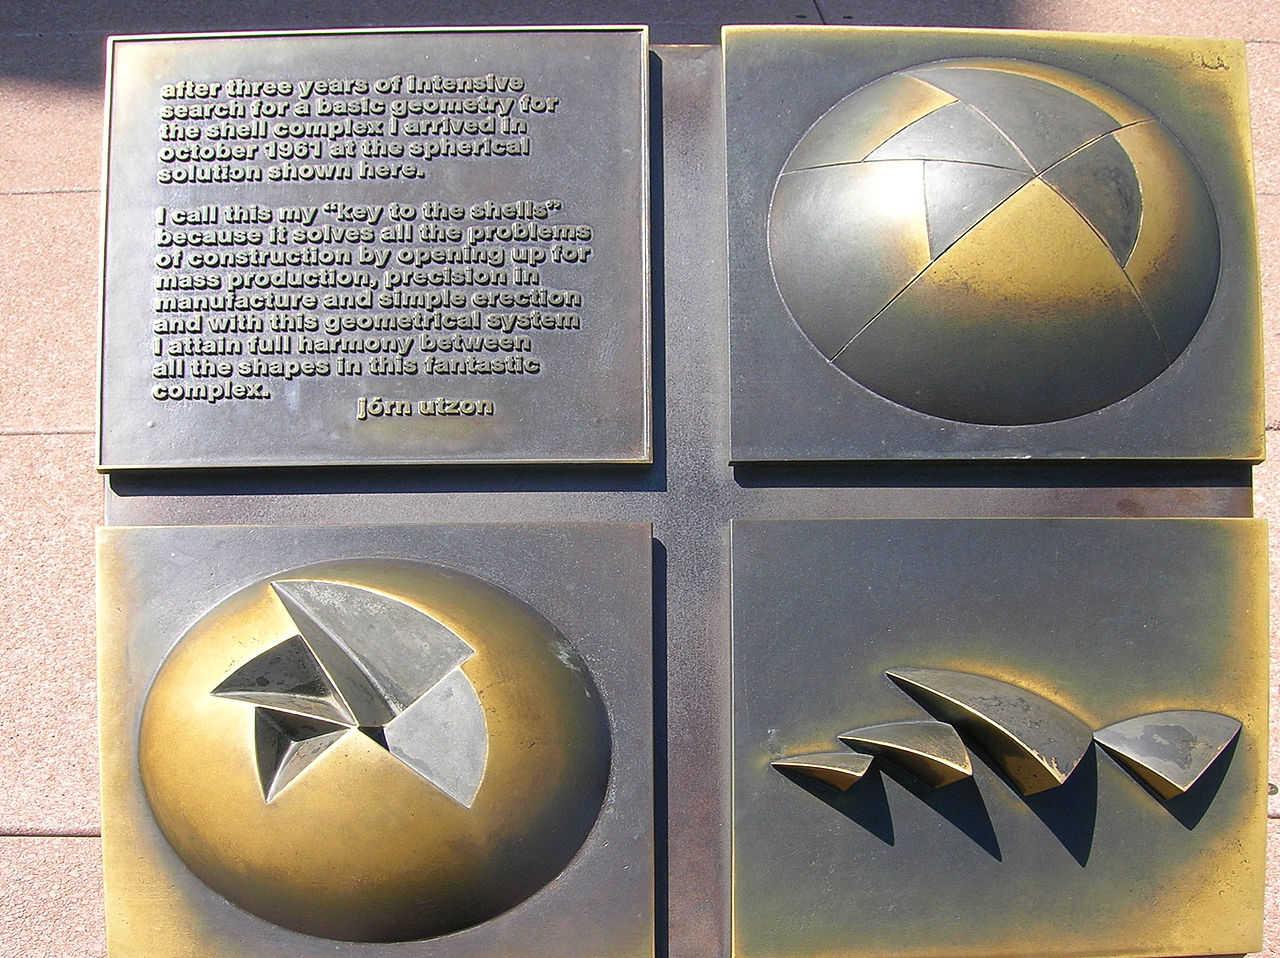 https://commons.wikimedia.org/wiki/File:Shells,Sydney_Opera_House,_Australia.jpg